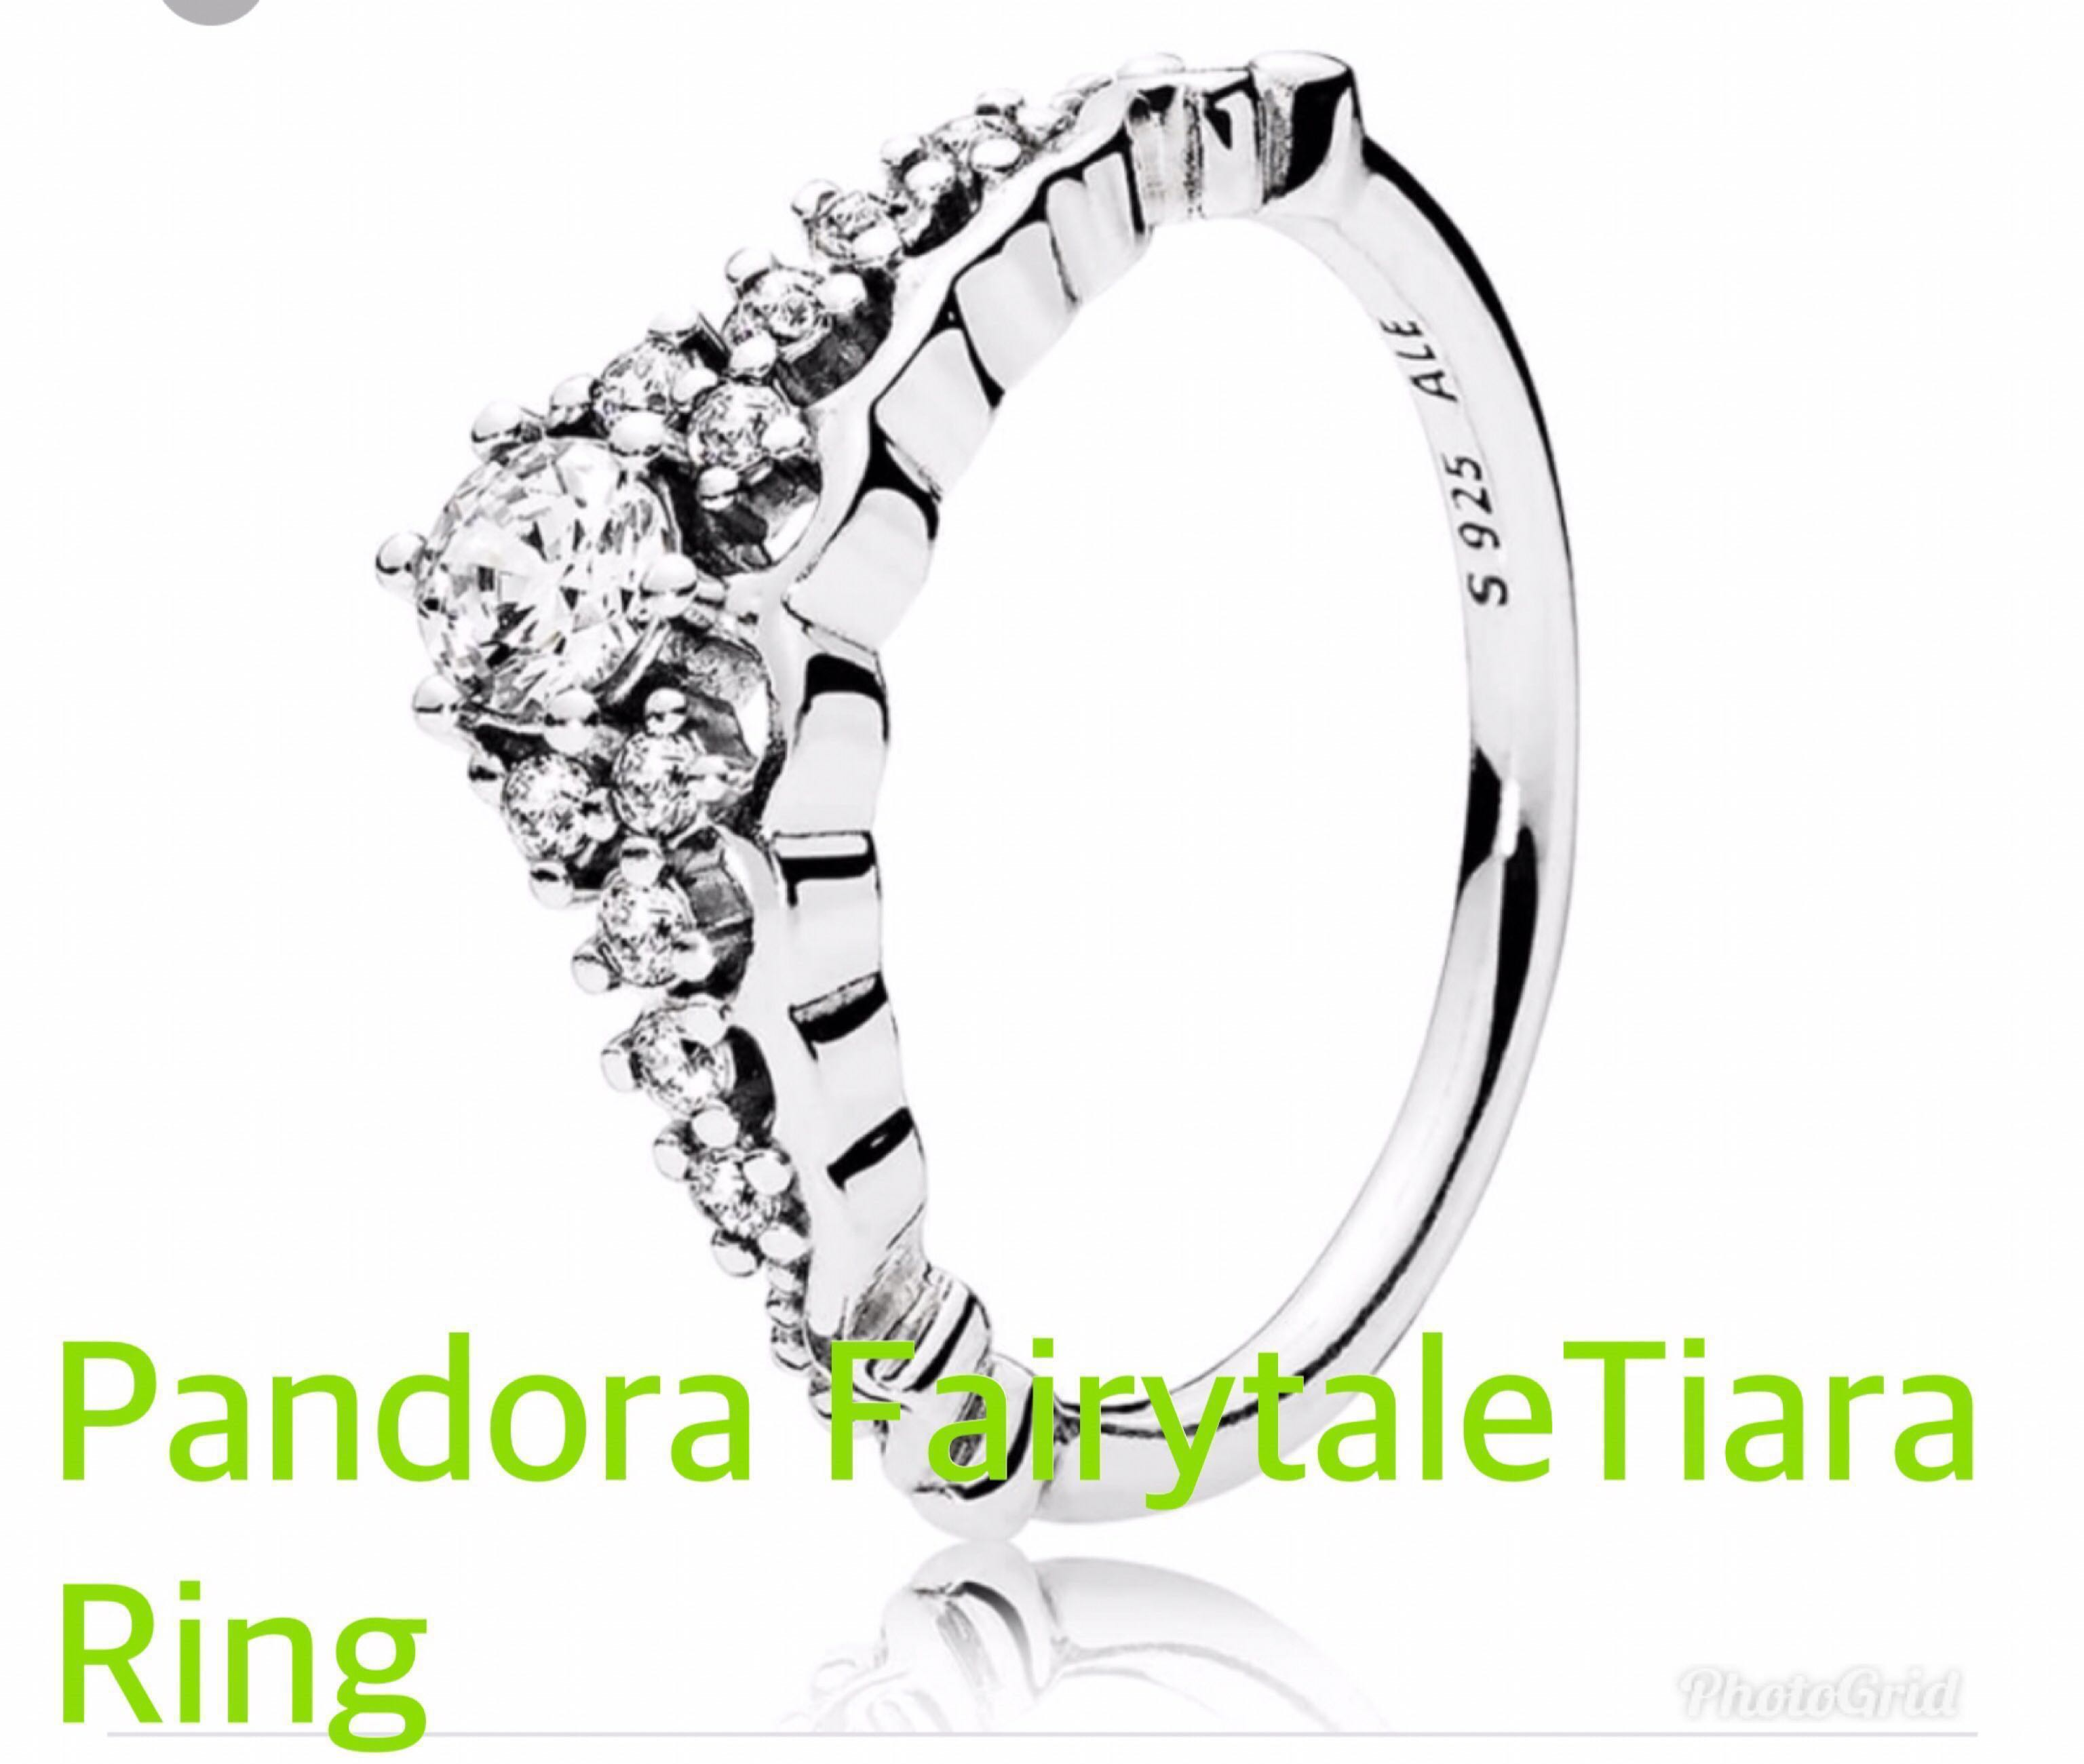 18694d44b Pandora Fairytale Tiara Ring, Women's Fashion, Jewellery, Rings on ...